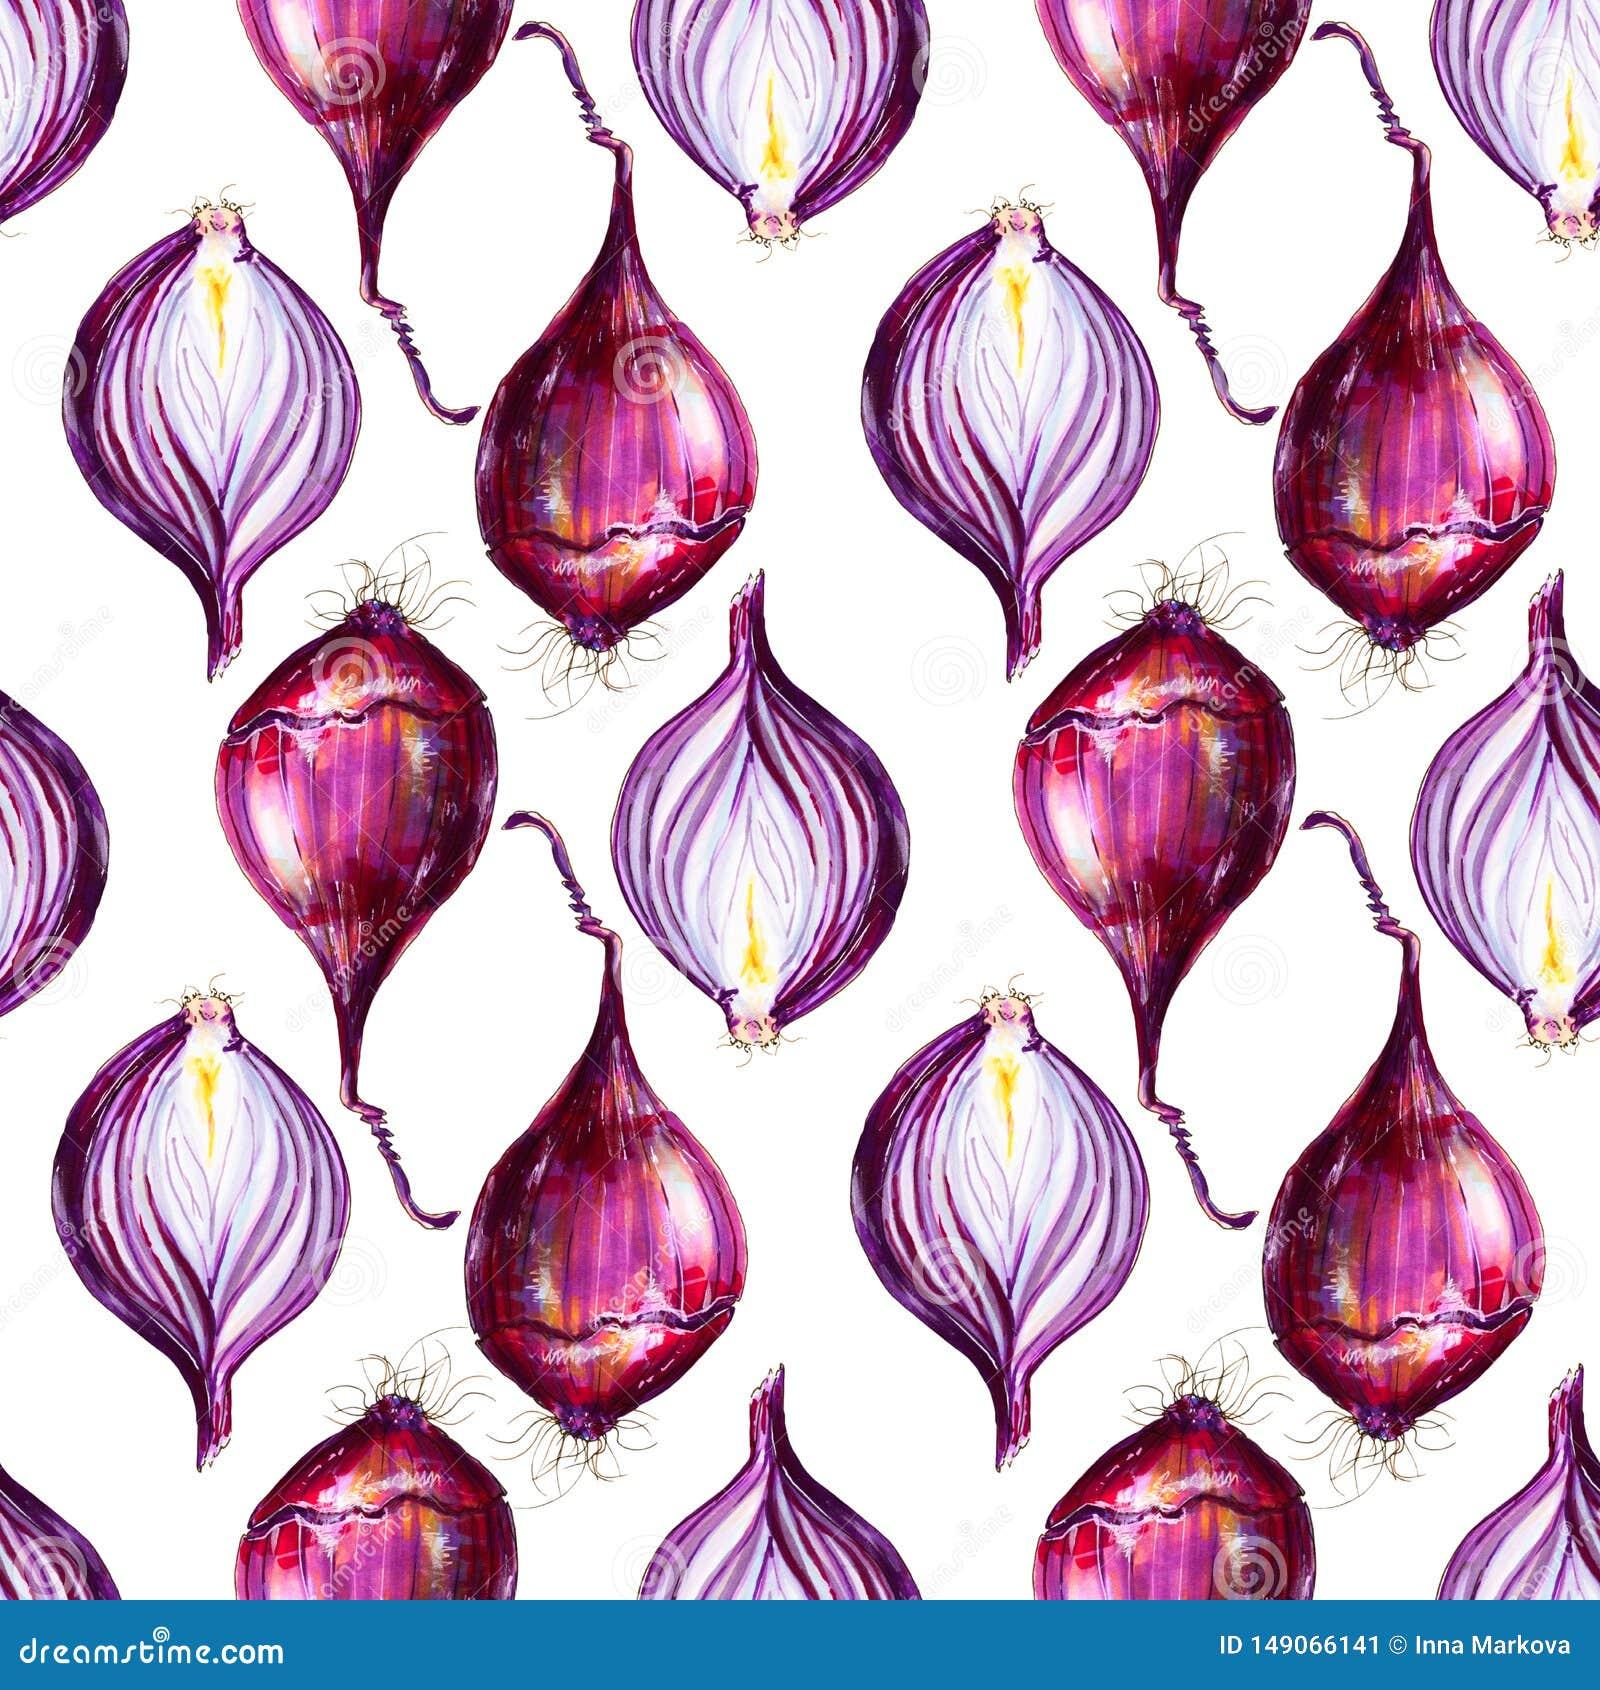 Red Onion In Cut Illustration. Hand-drawn Healthy Food ...